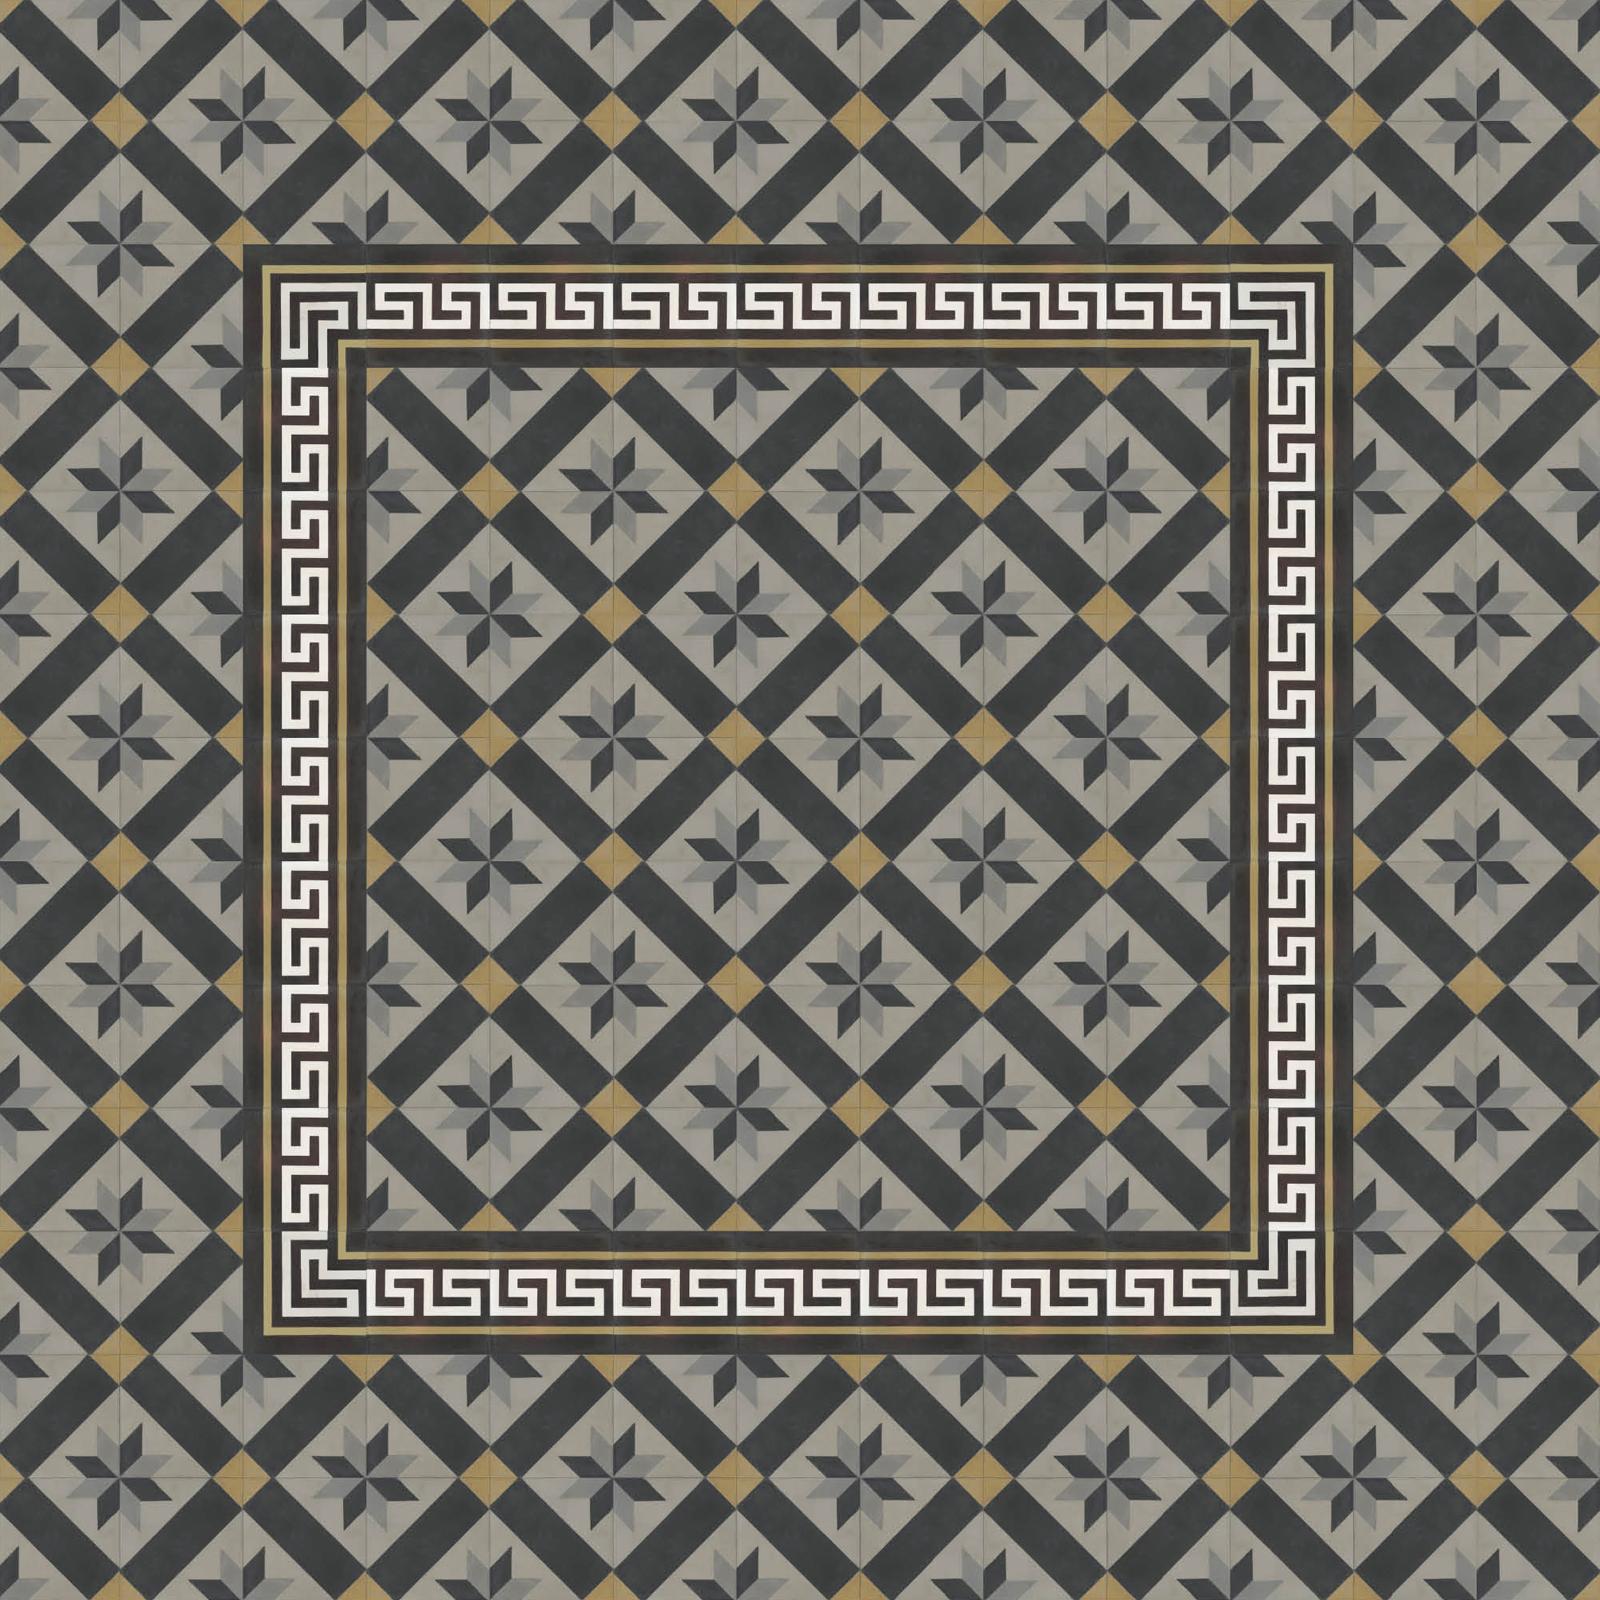 zementmosaikplatten-nr.51109-verlegemuster-mit-rand-B-viaplatten | 51109